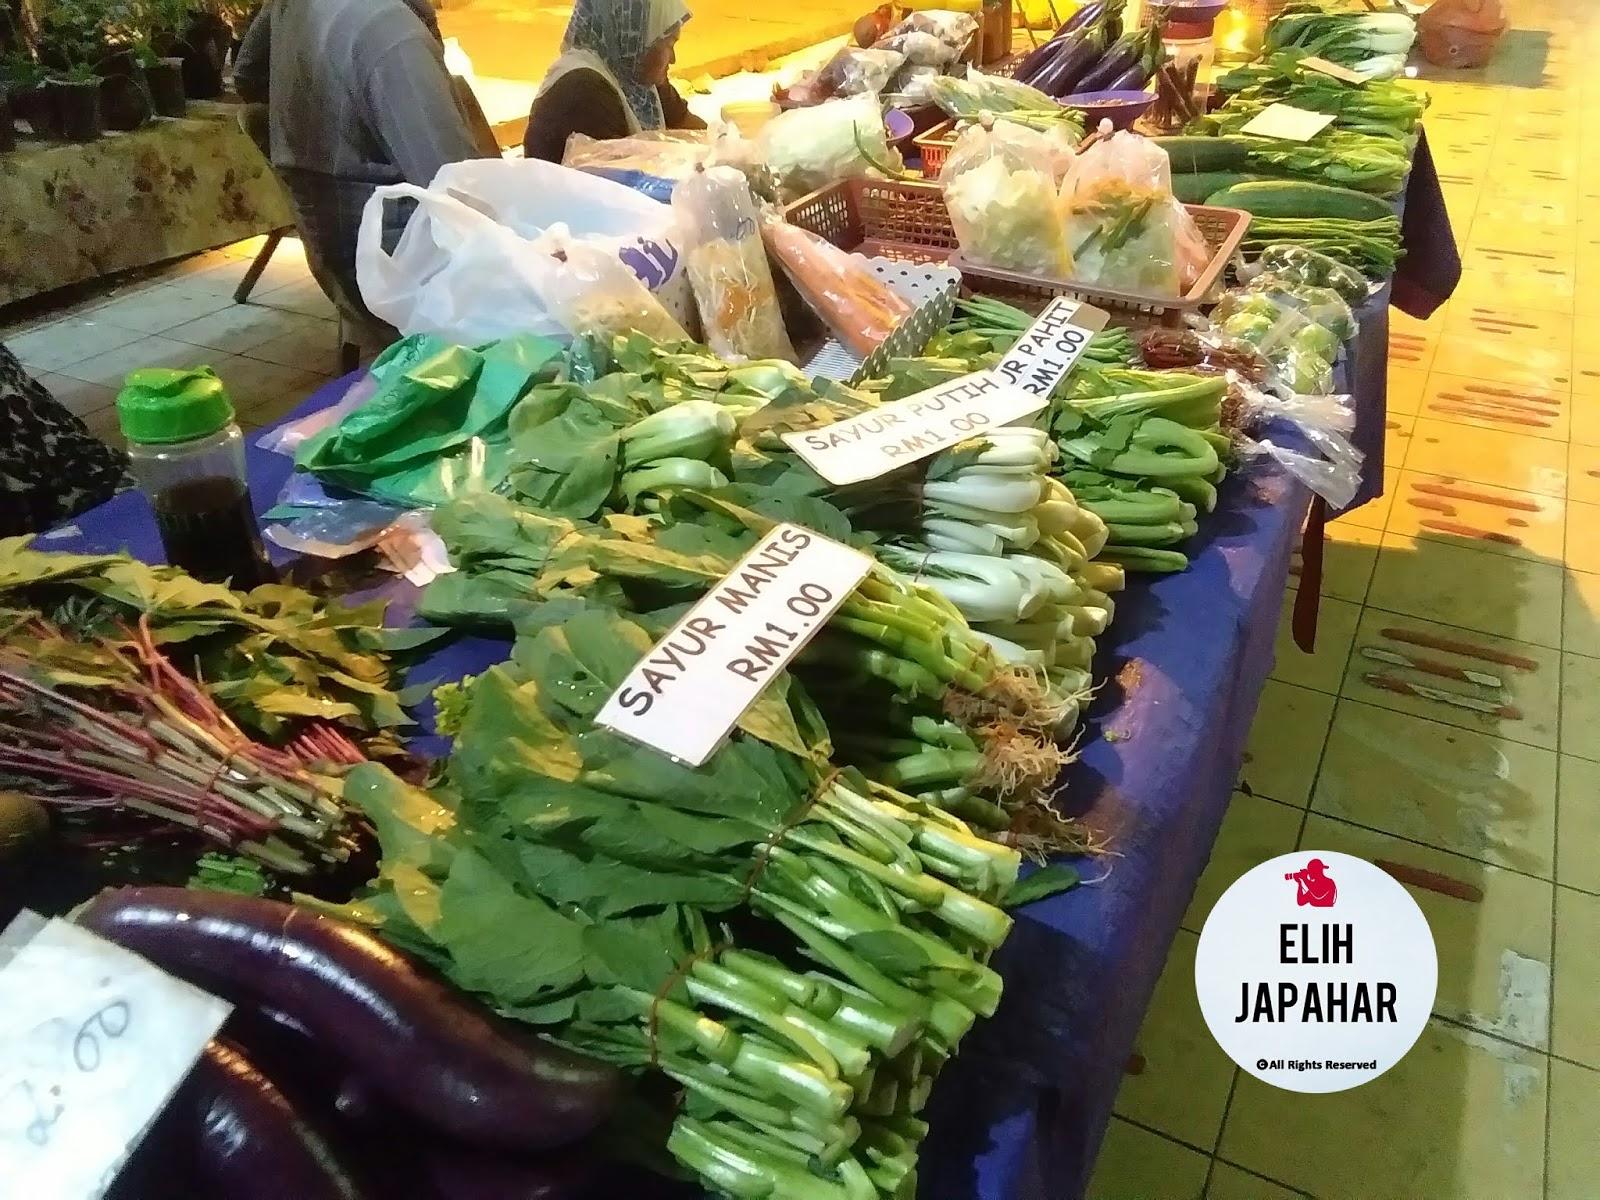 Pasar Malam Keningau Viral, Harga Sayur RM1 Sahaja